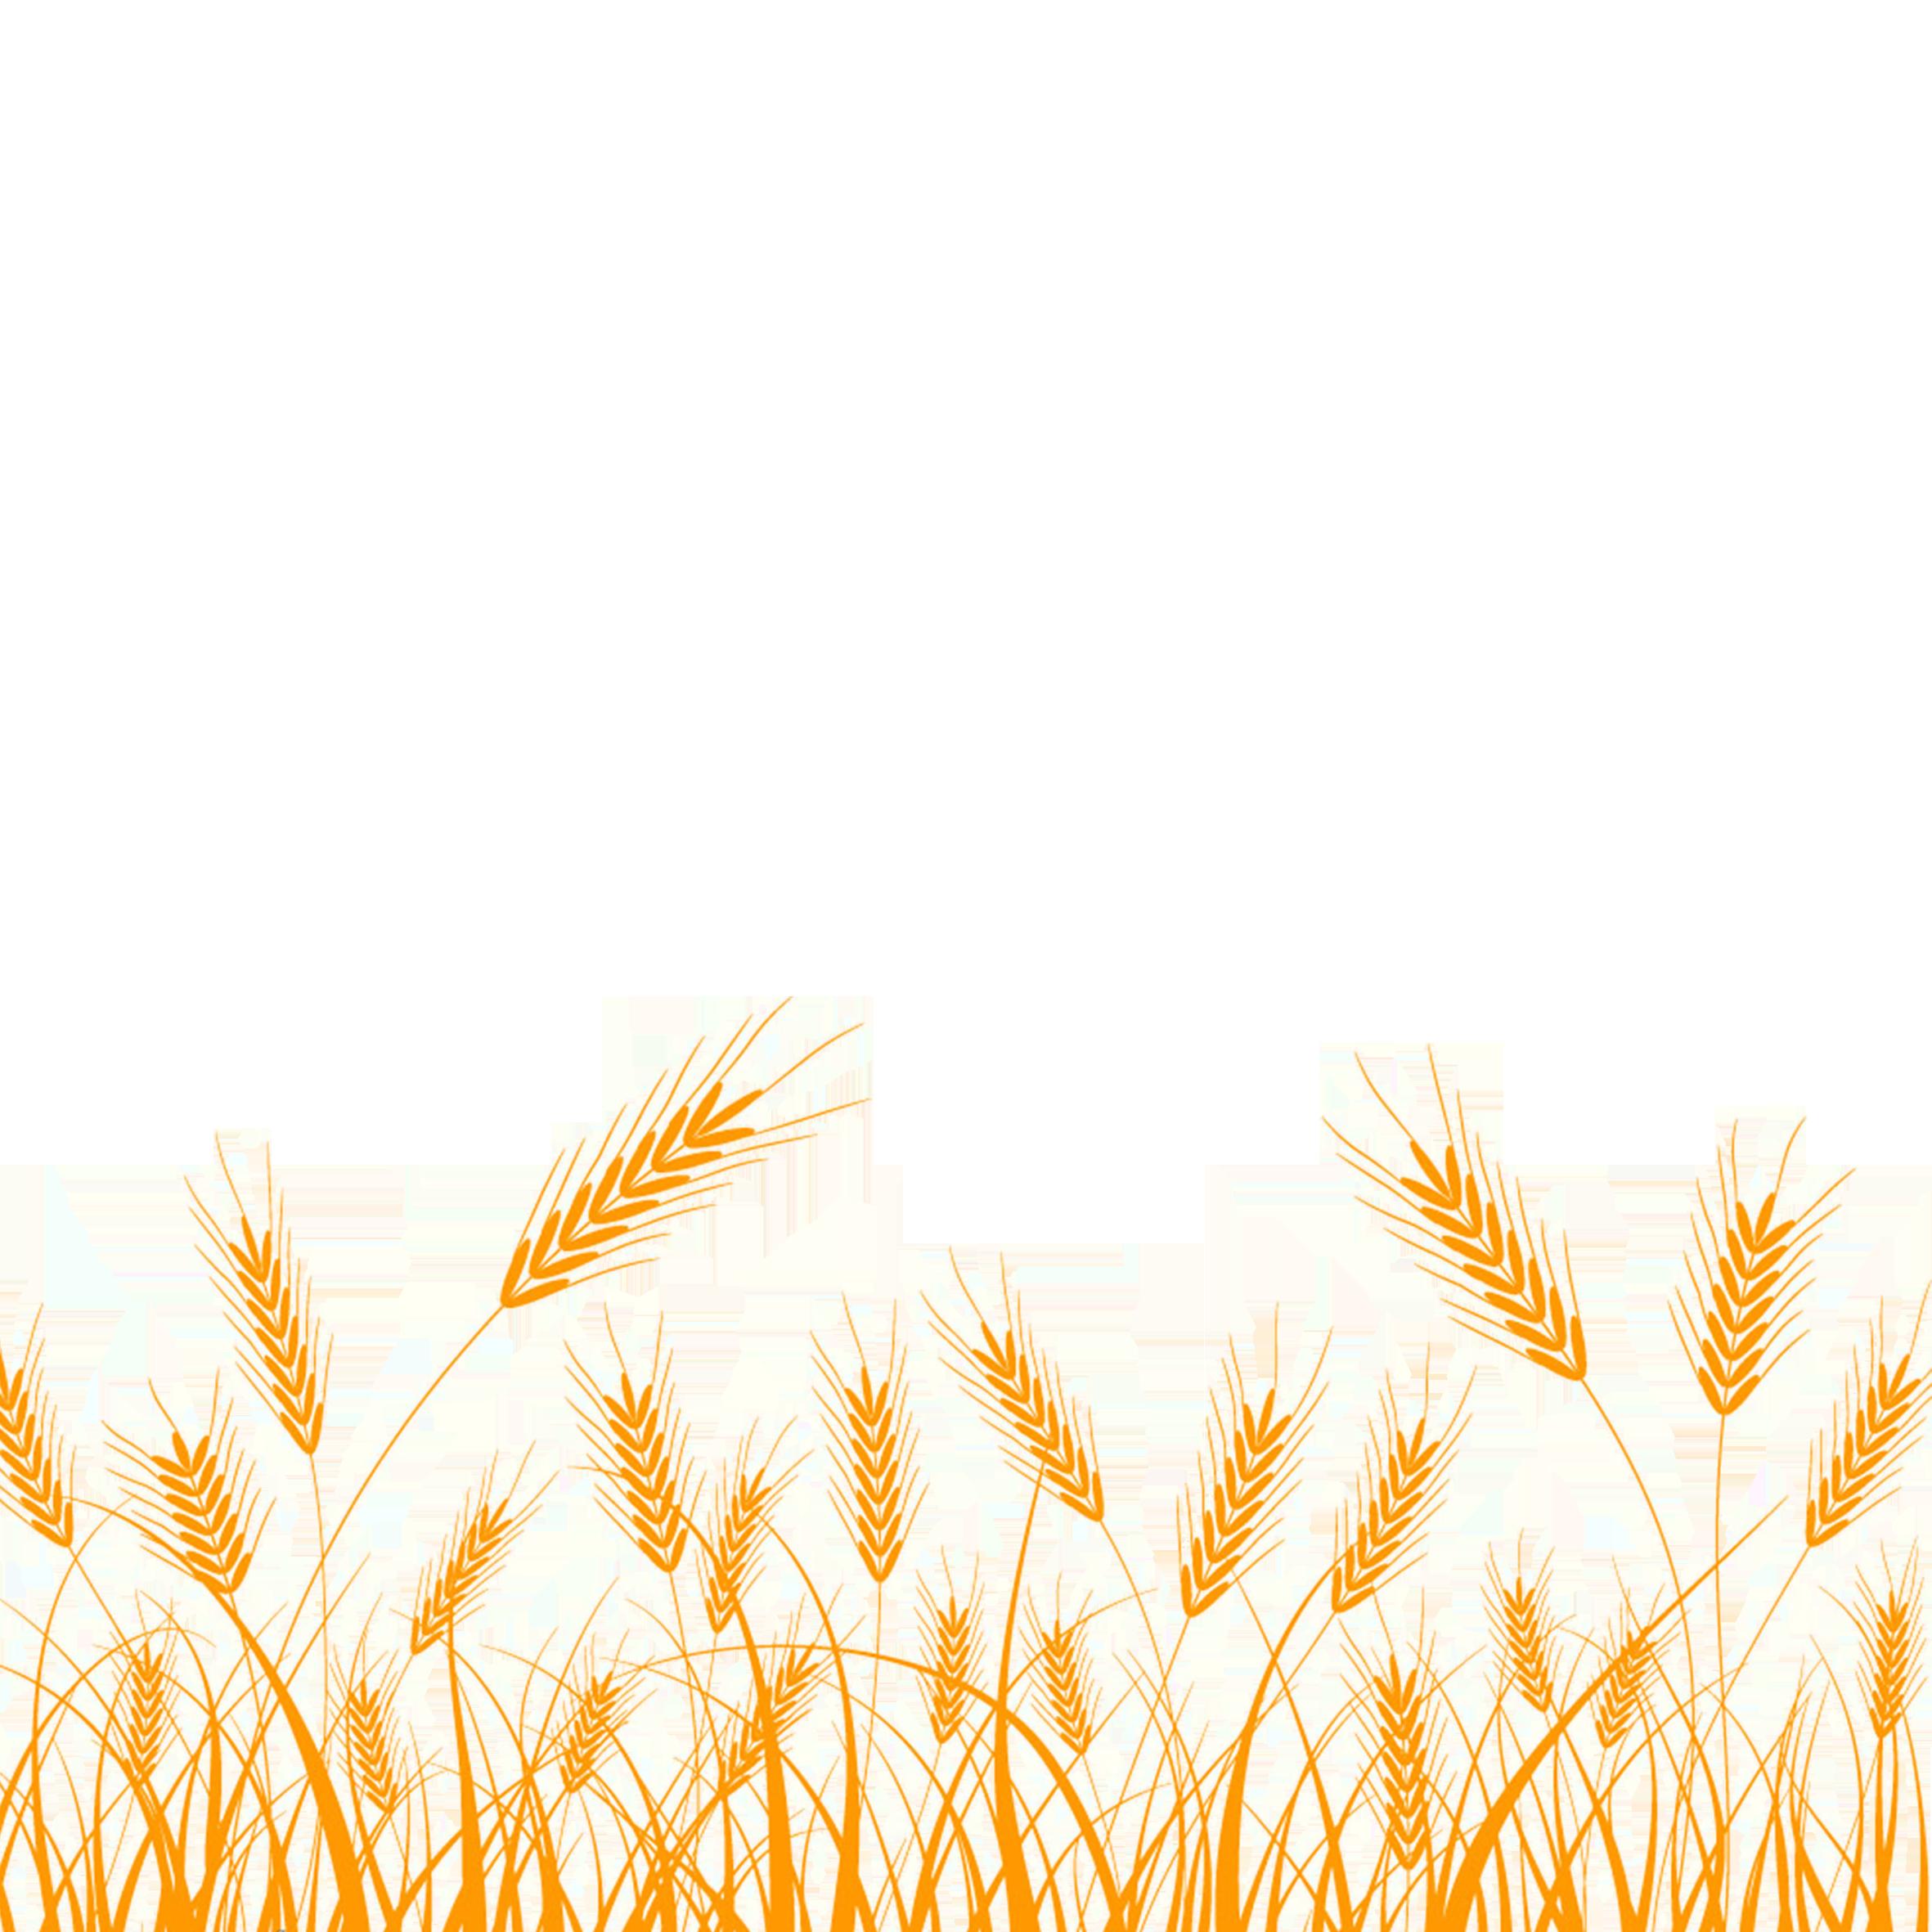 Wheat field silhouette clipart graphic Wheat Silhouette Clip art - Rice png download - 2362*2362 ... graphic